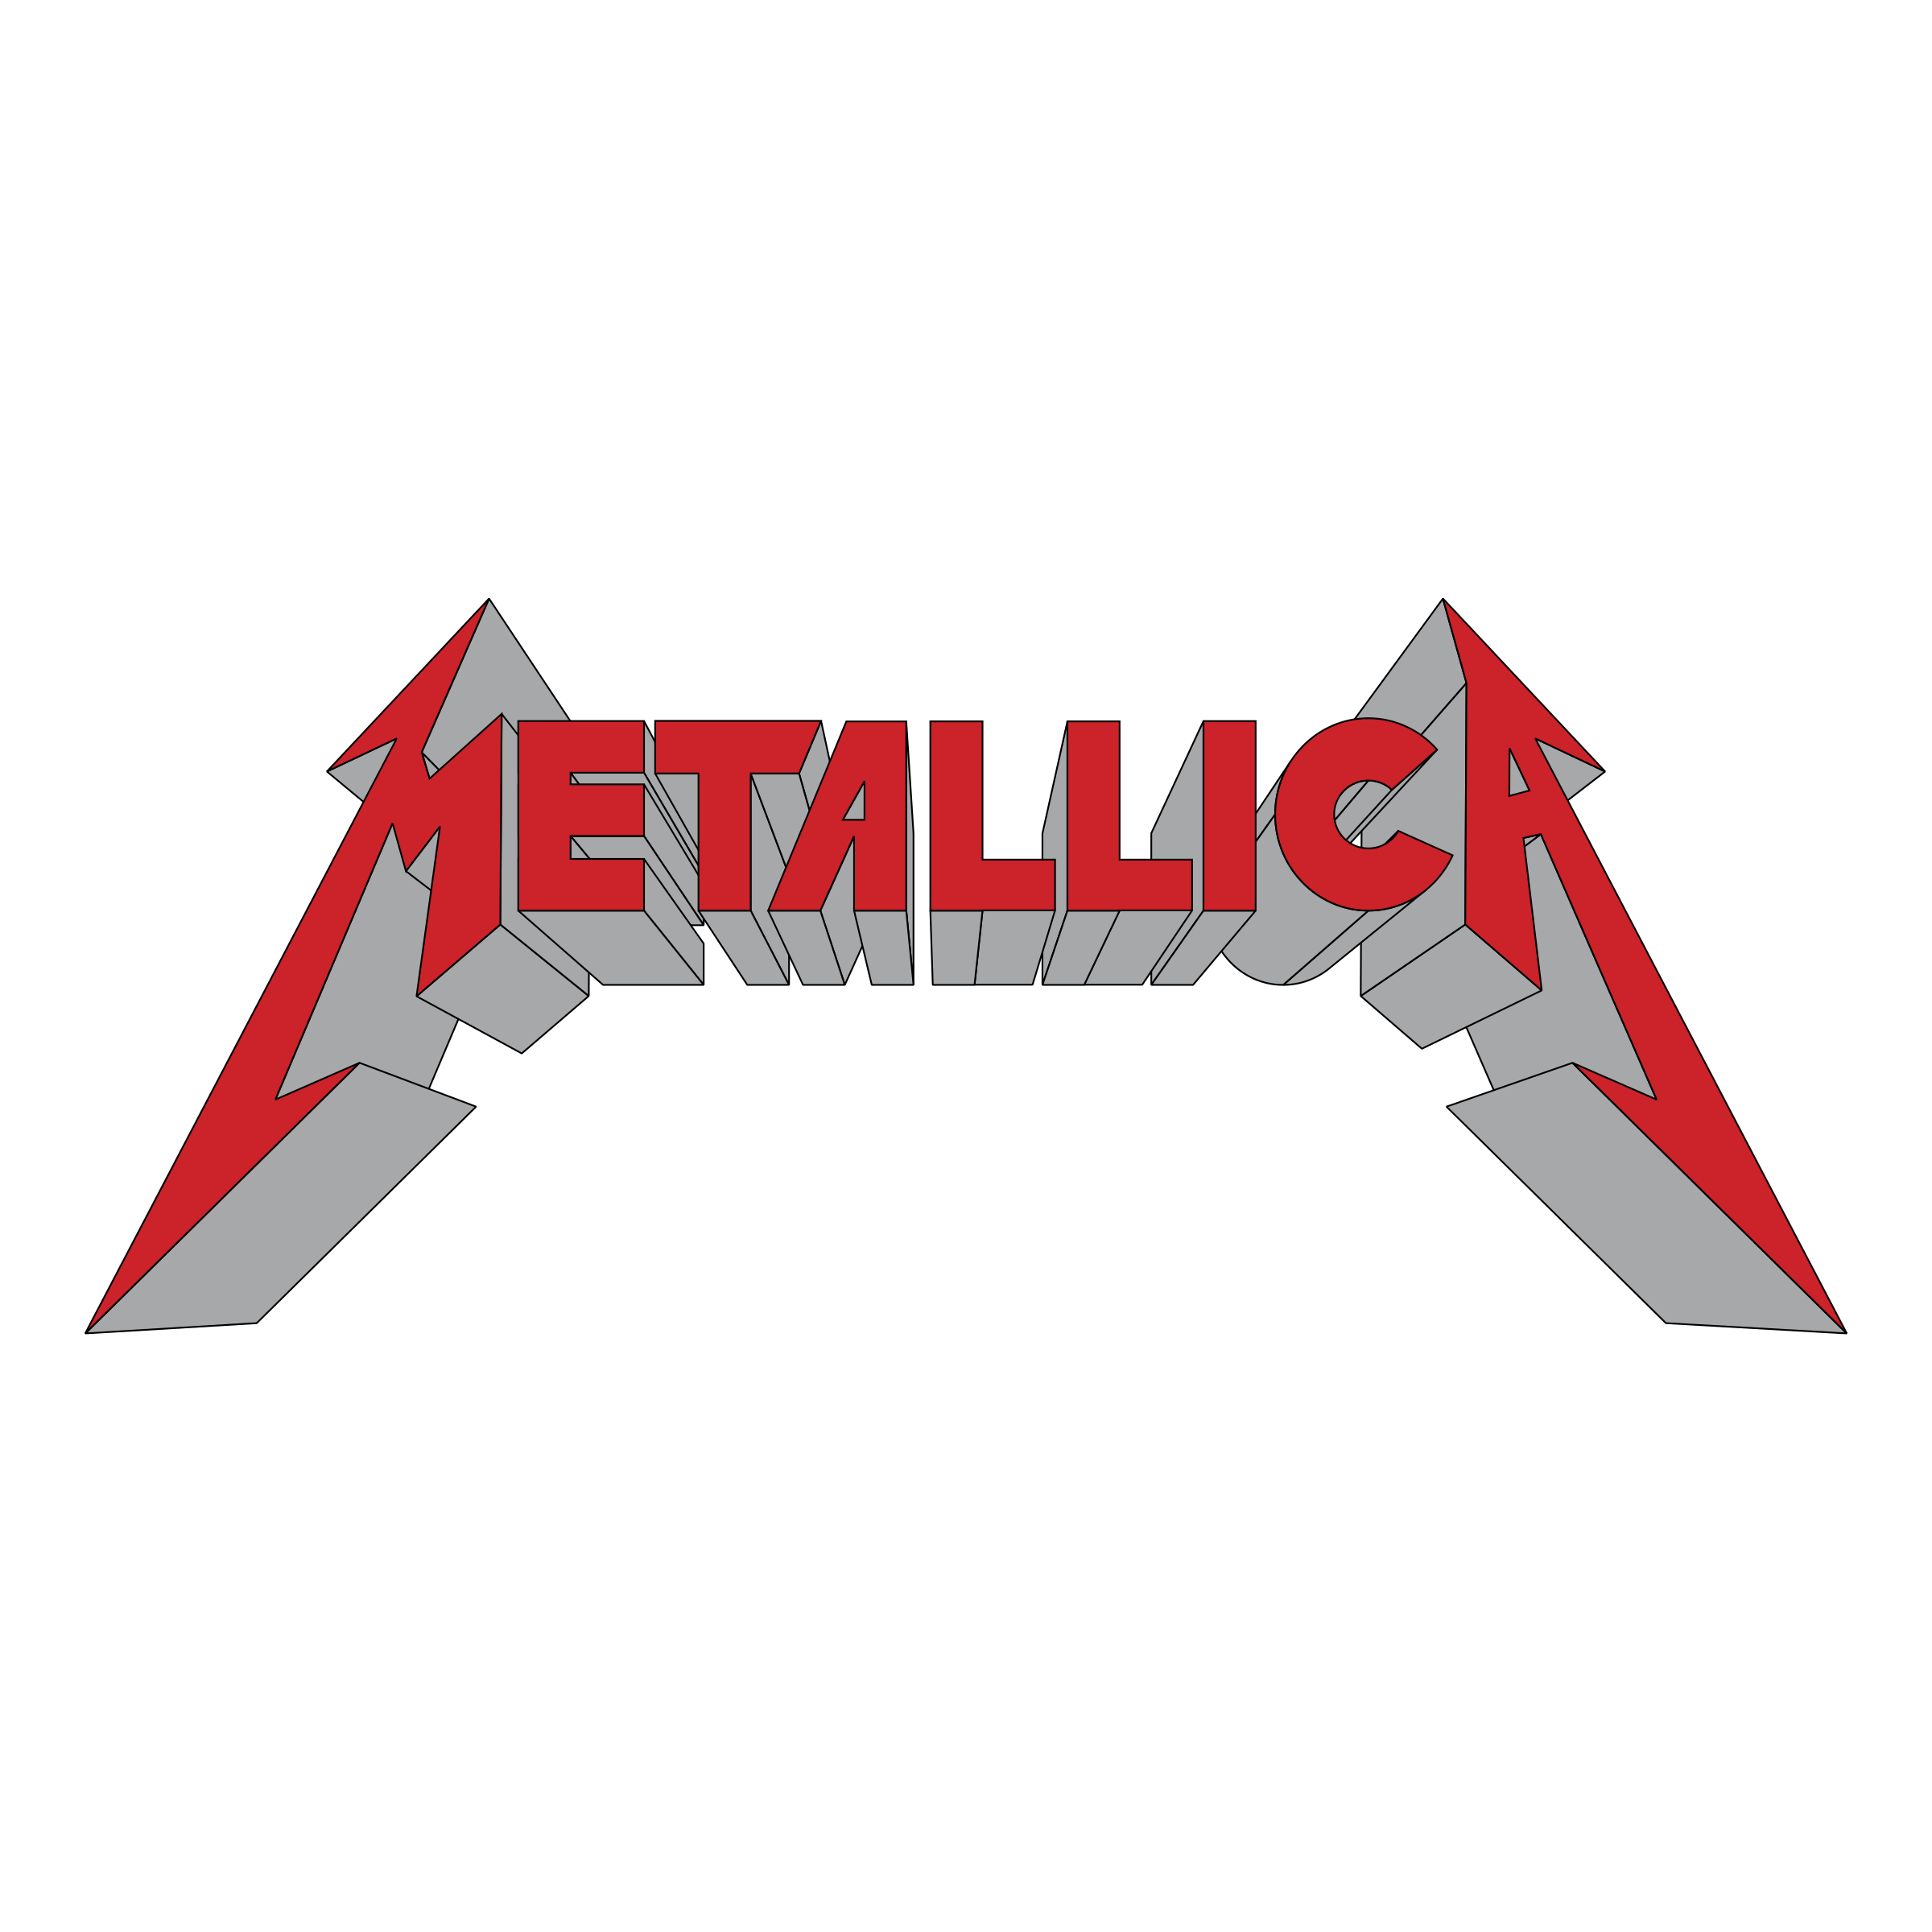 Metallica – Logos Download